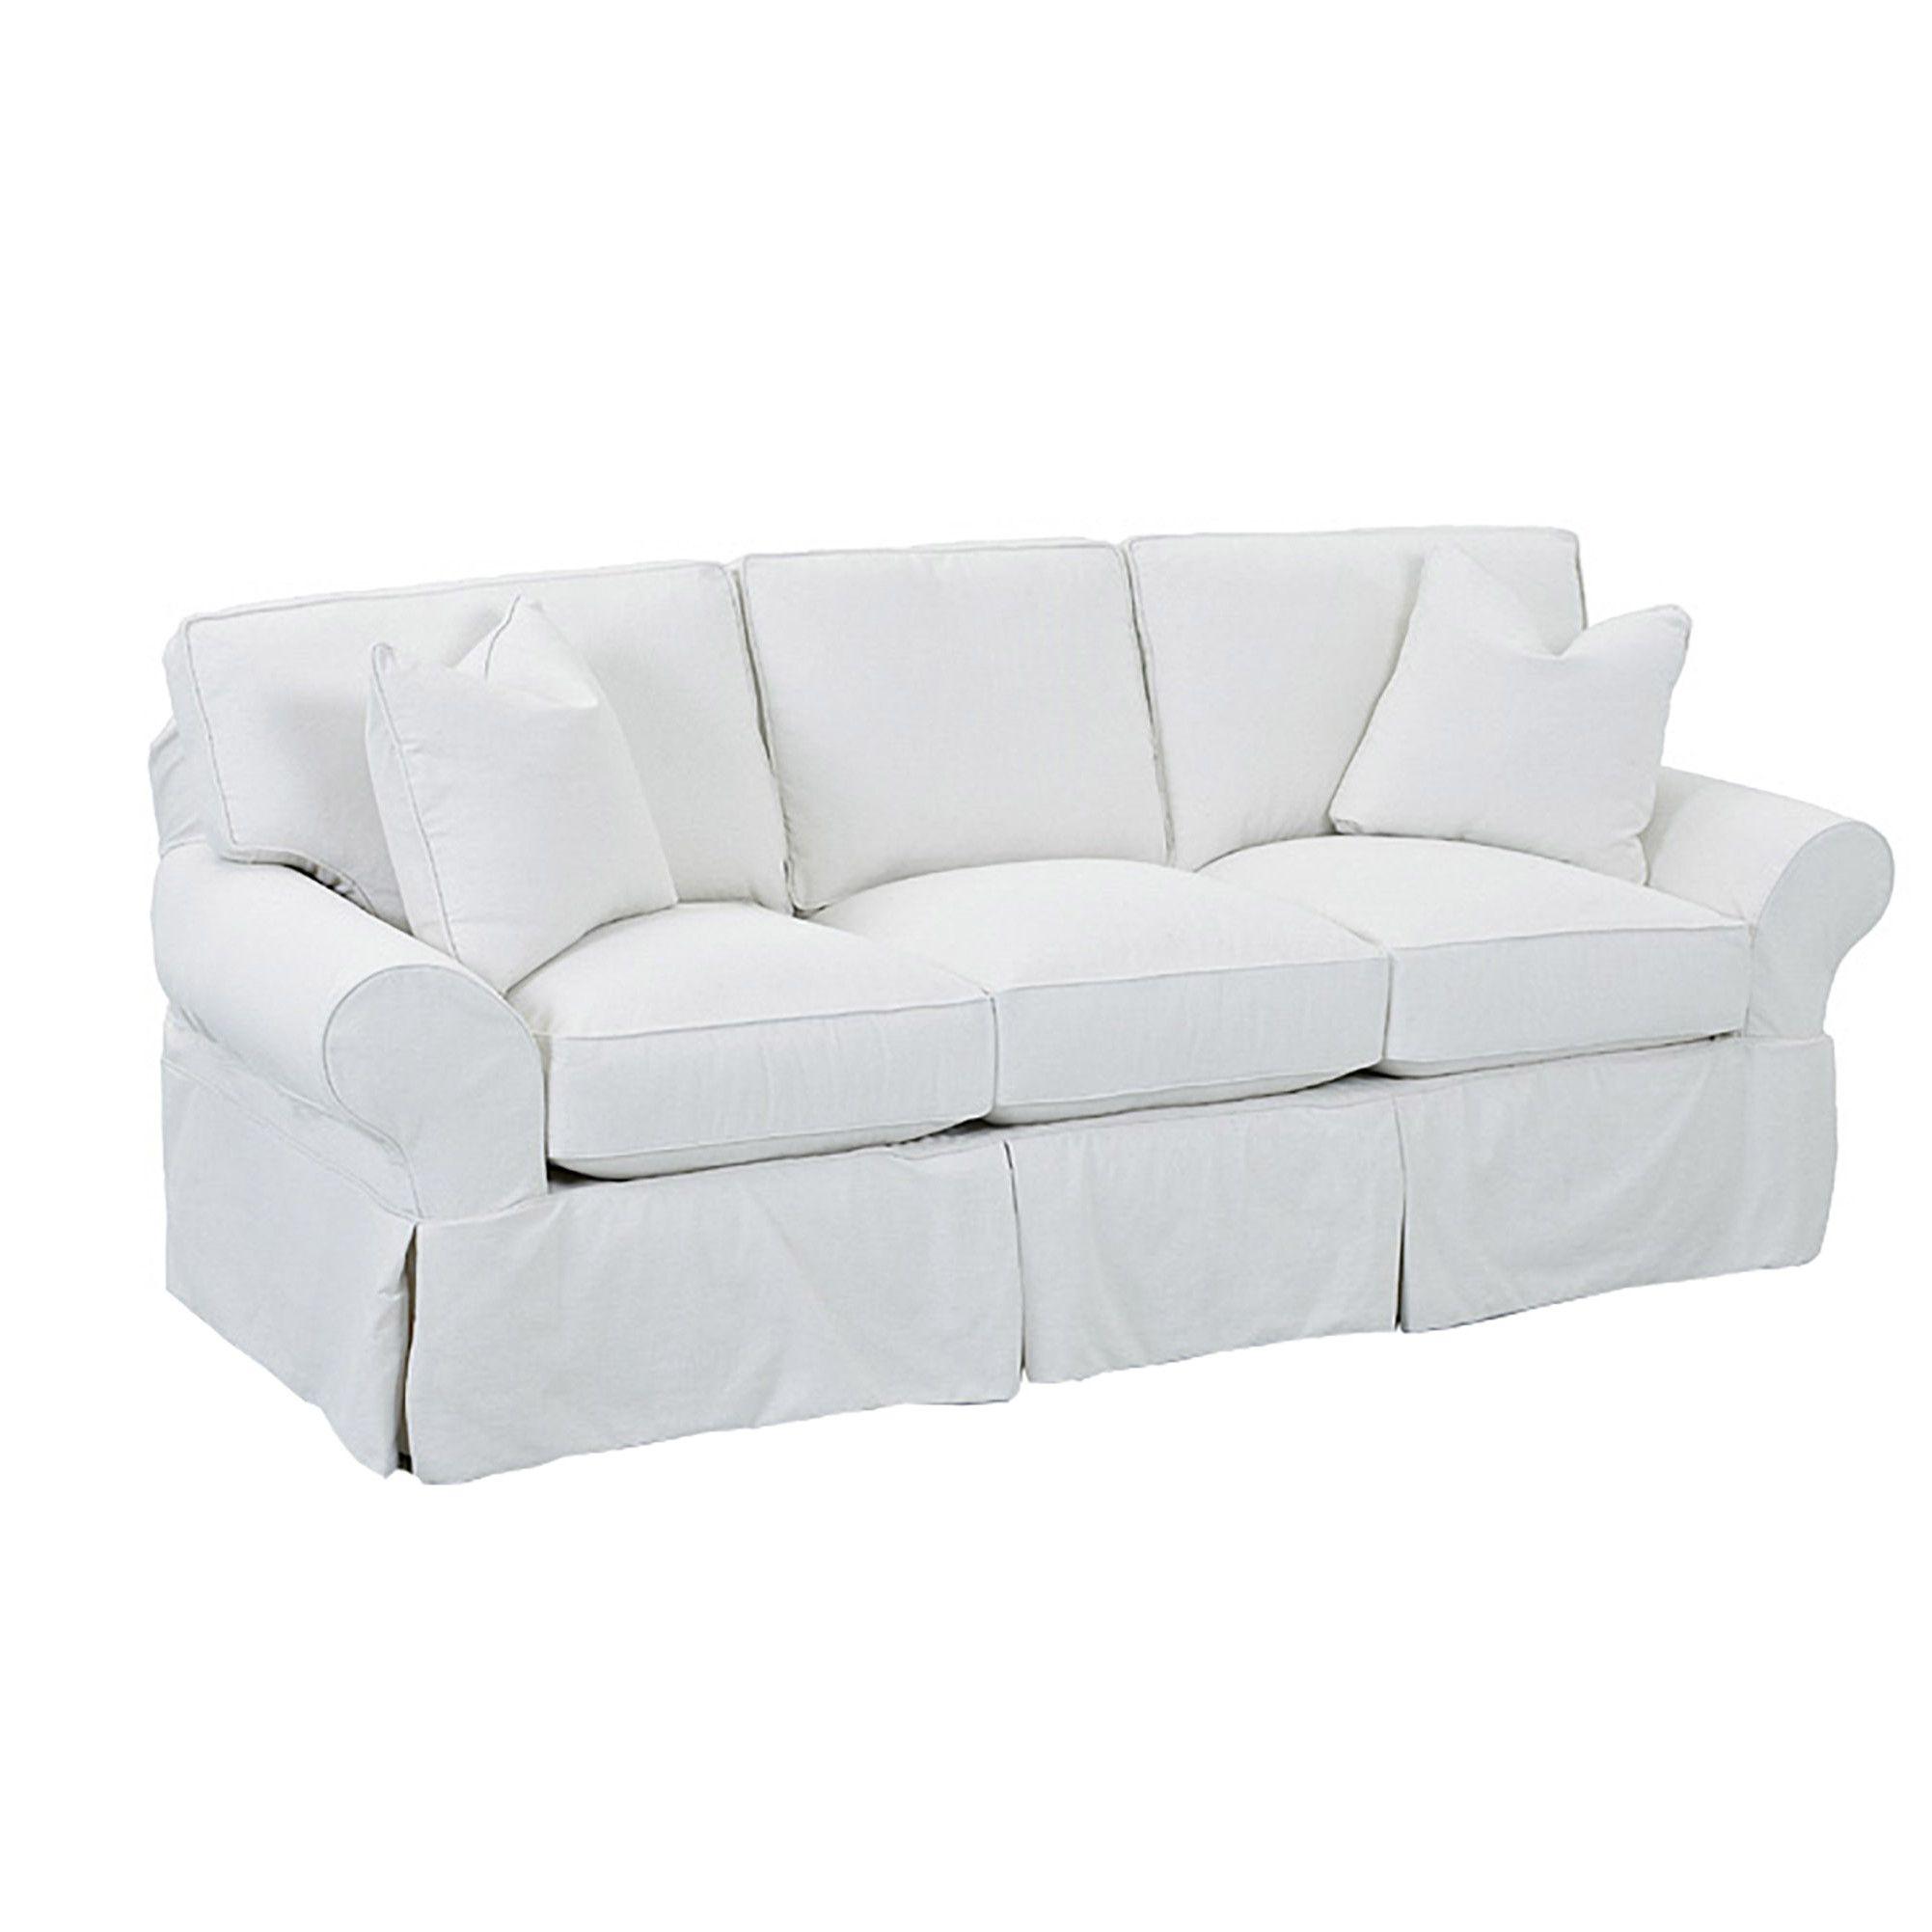 Wayfair Custom Upholstery Casey Sofa Slipcovered Sofa